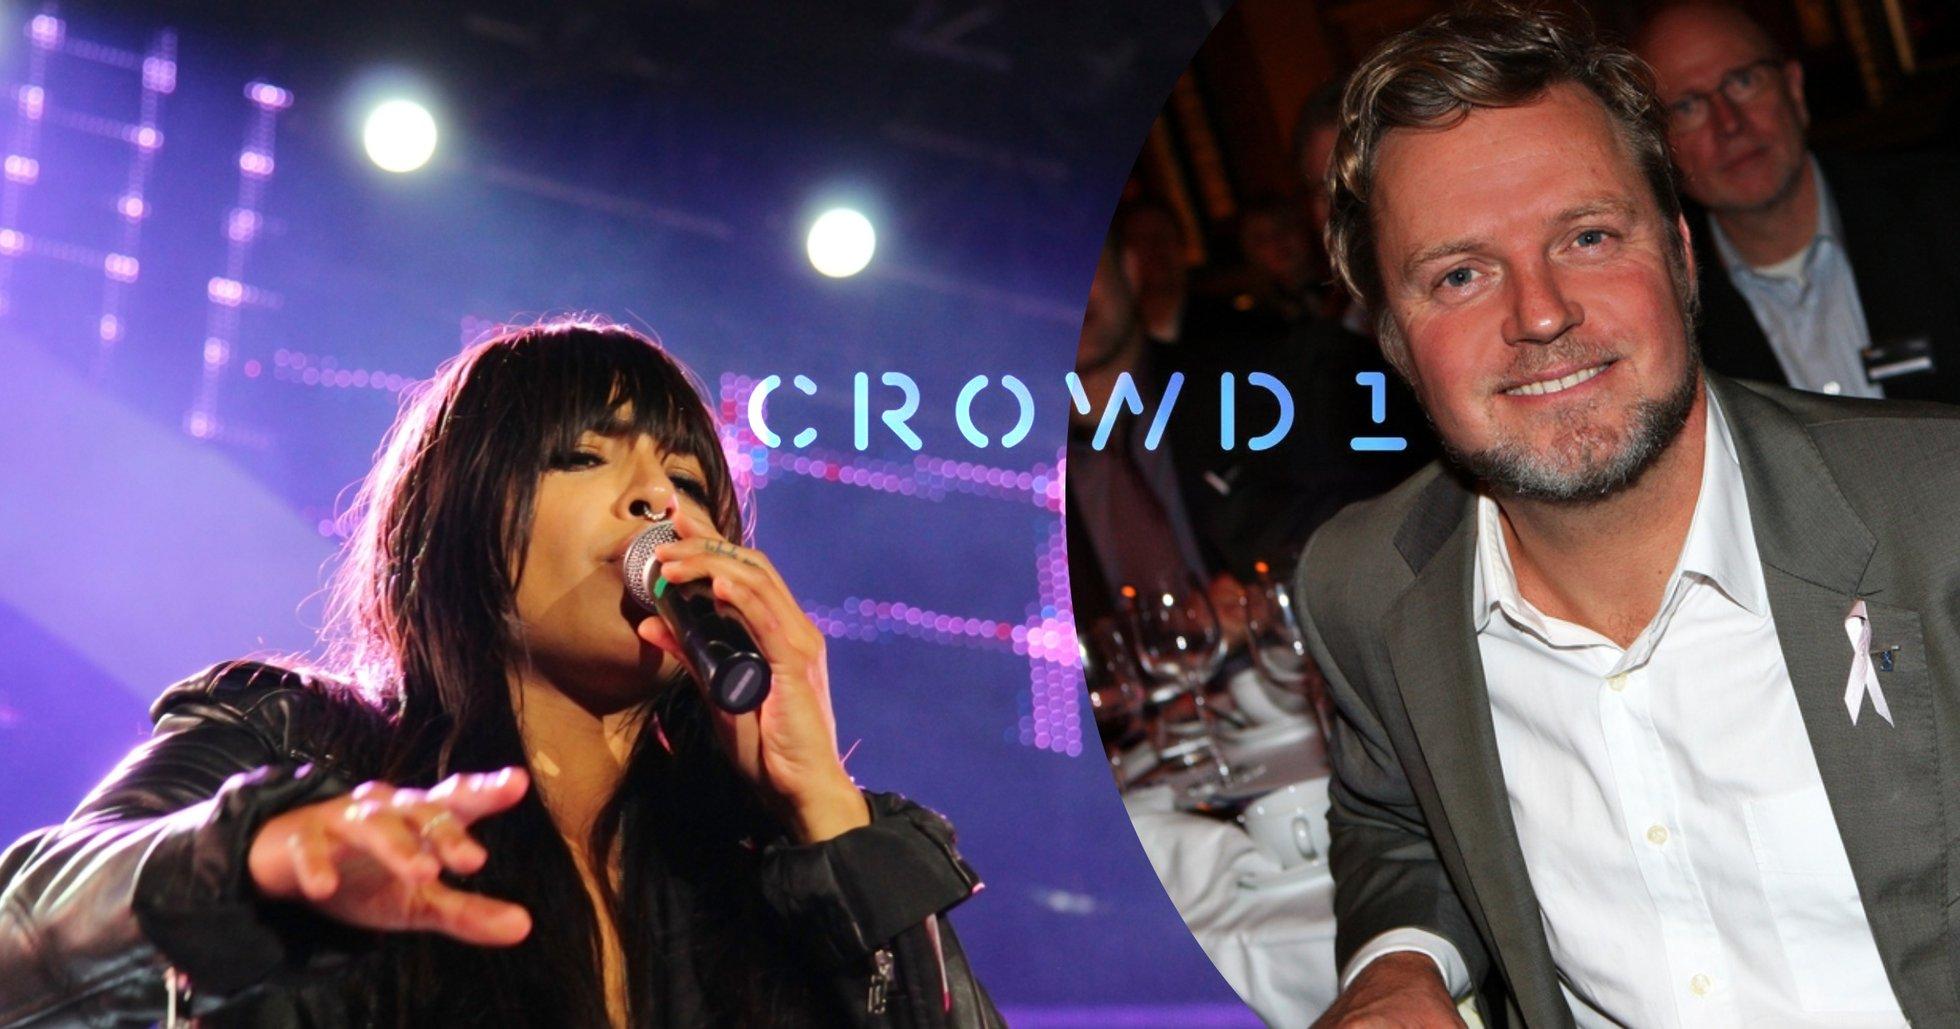 Loreen uppträdde när pyramidanklagade Crowd1 lanserade ny reseapp